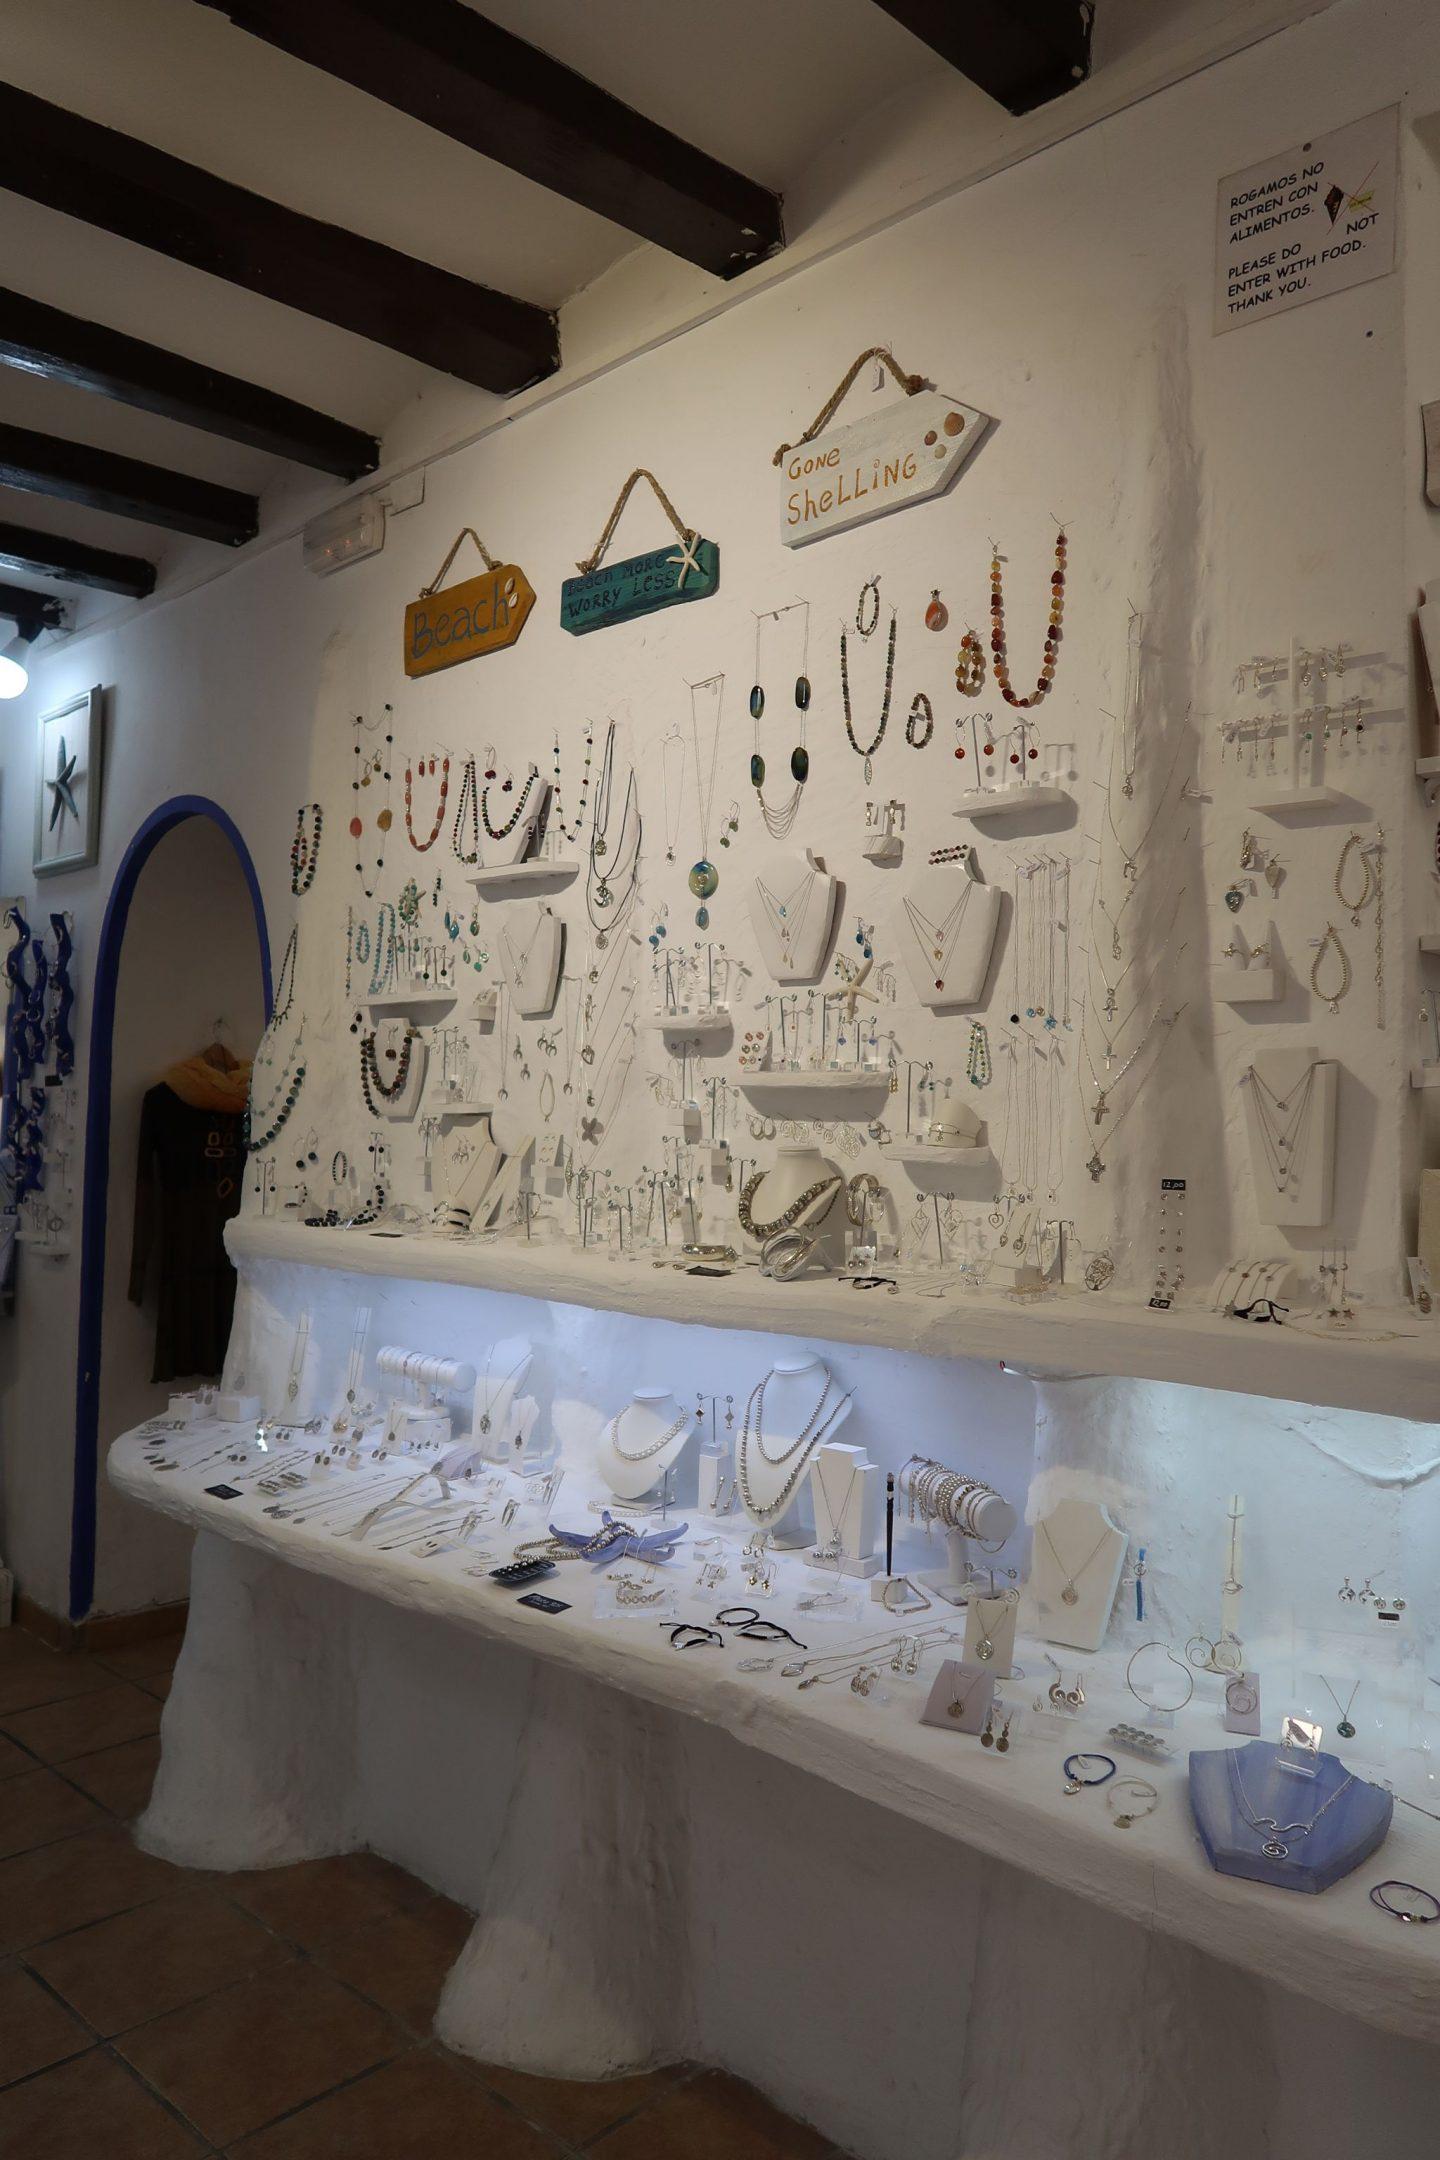 Jewellery Boutique Altea whatLauraLoves uk Travel blog